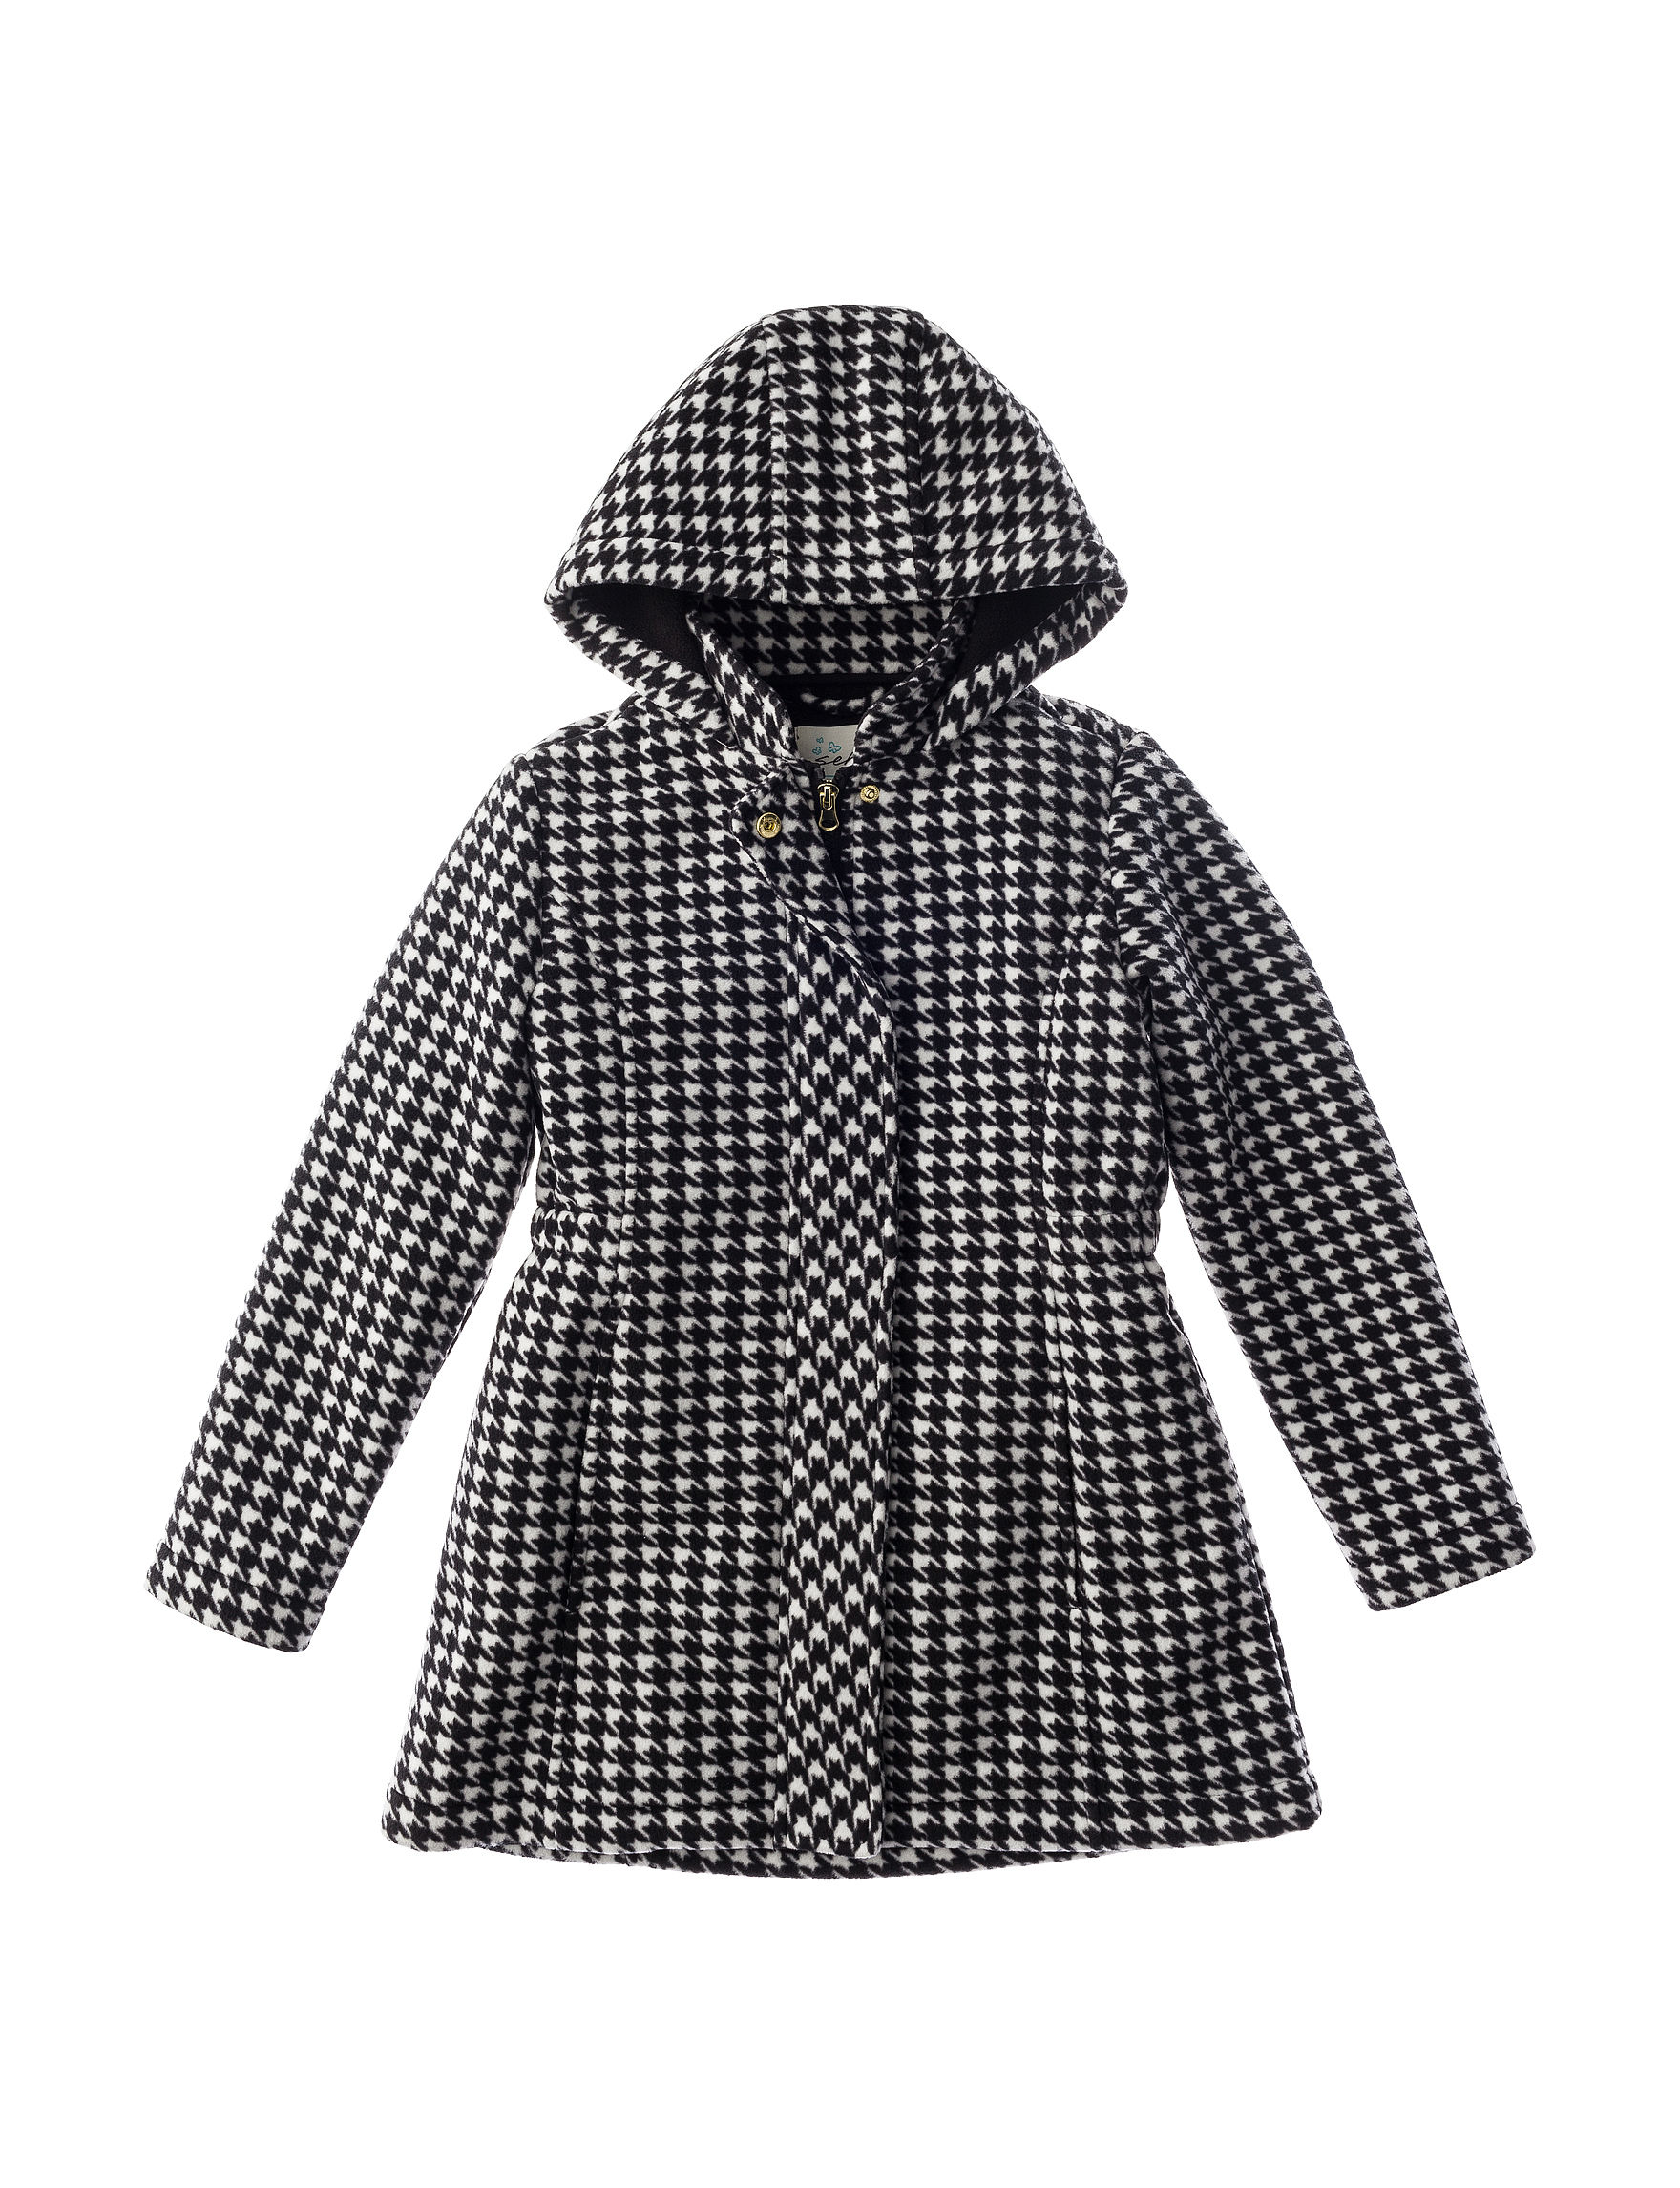 Sebby Collection Black / White Fleece & Soft Shell Jackets